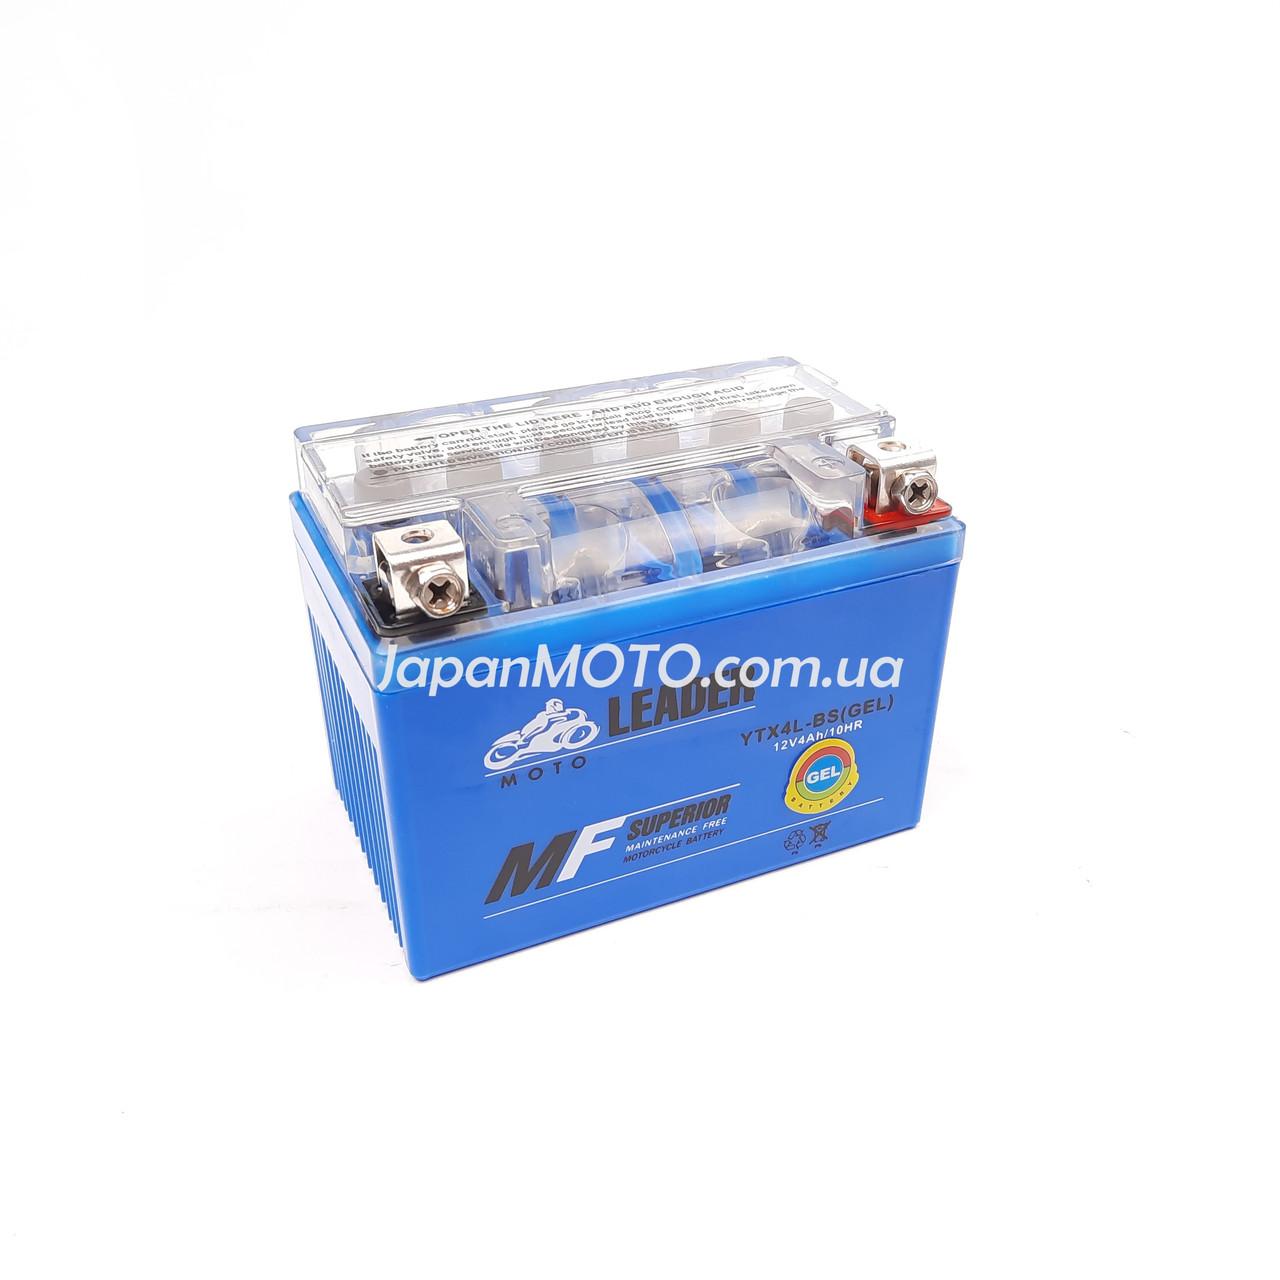 Аккумулятор 4A 12V Honda/Yamaha (YTX4L-BS) LDR синий 2021